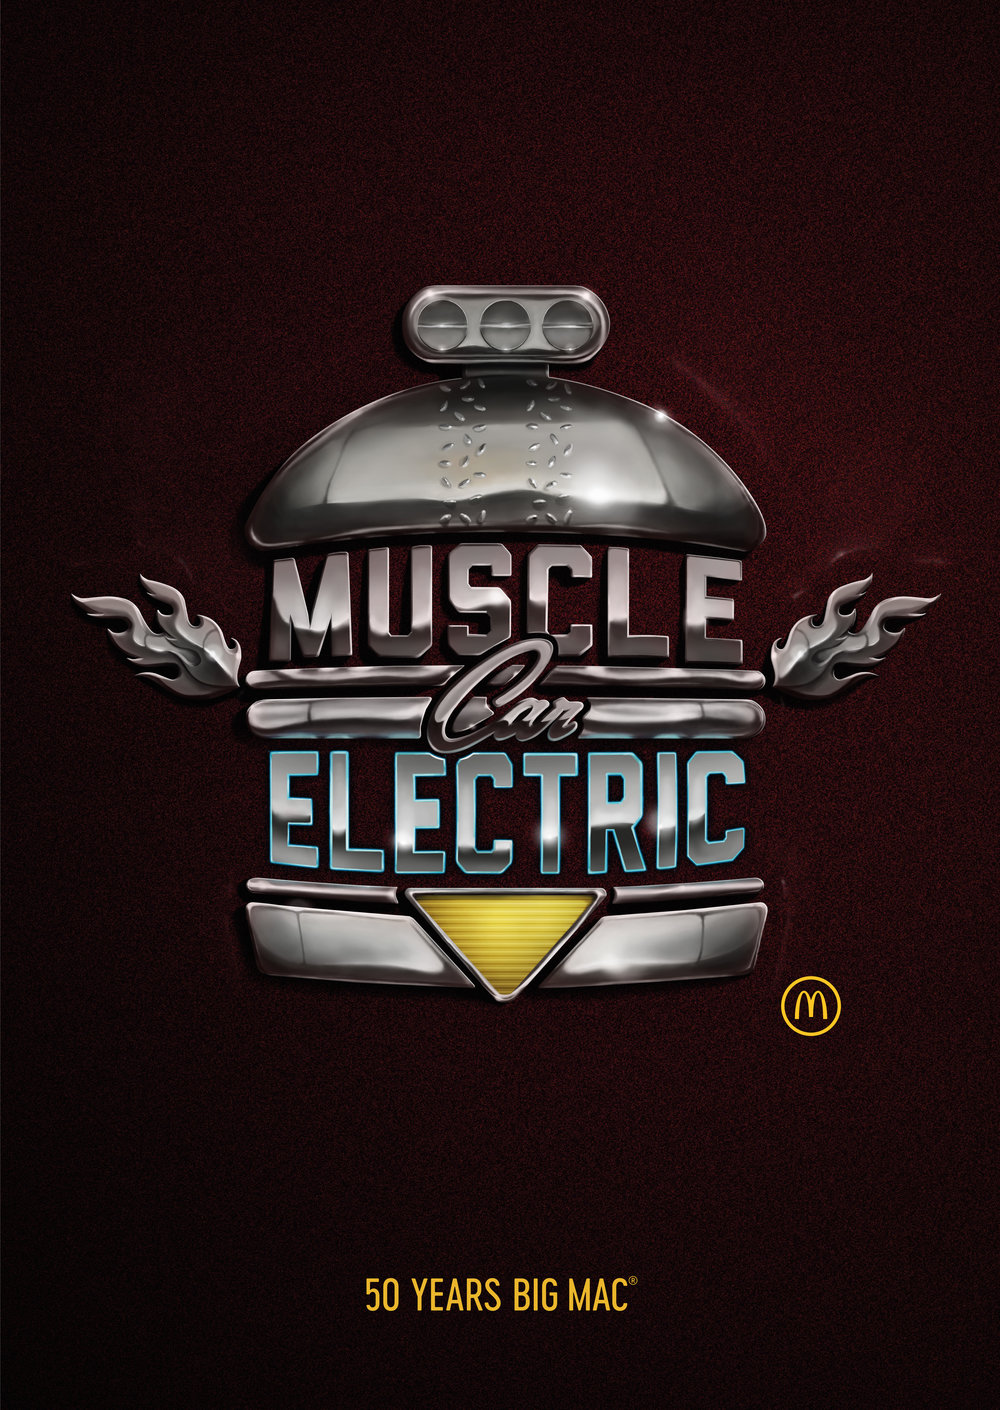 48_Muscle:Electric.jpg